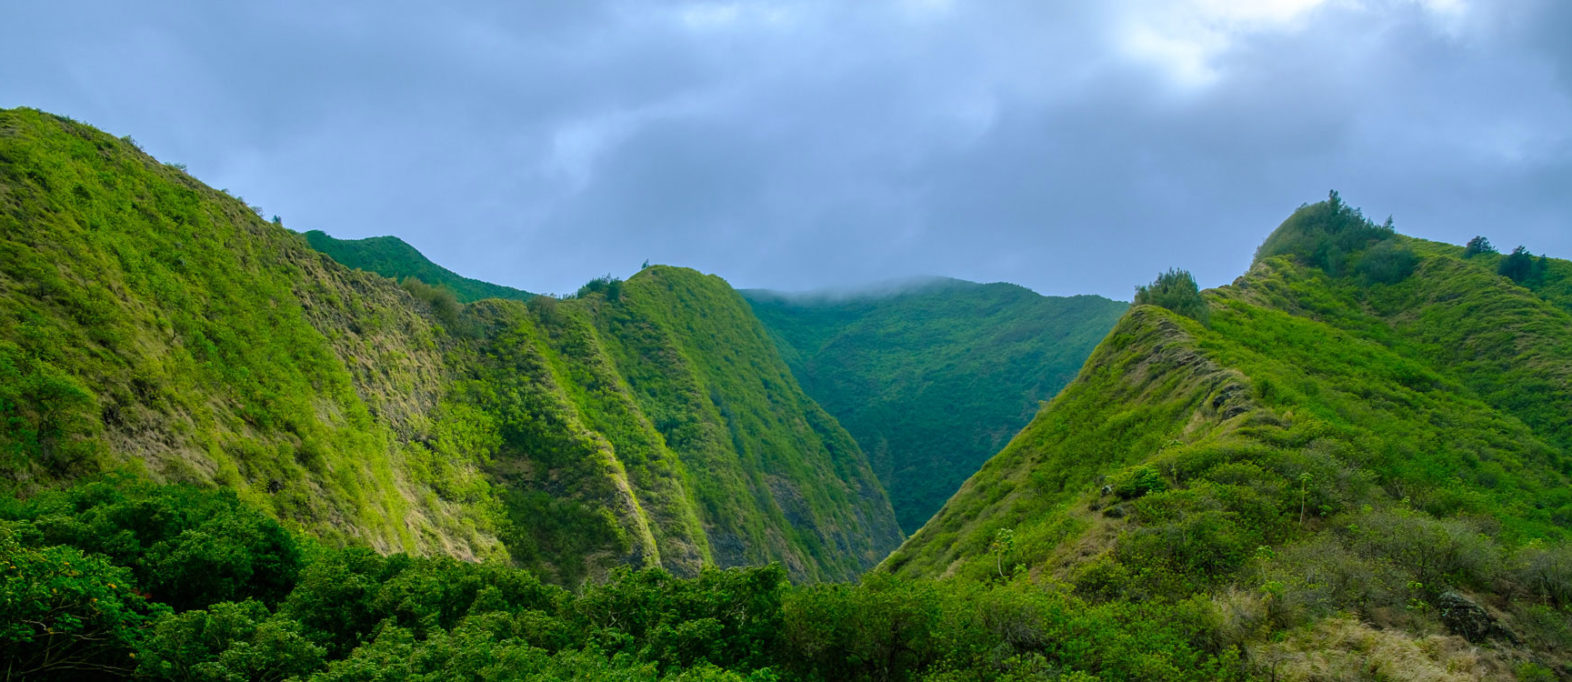 Hawaii Urlaub Tipps ©Ines Thomsen